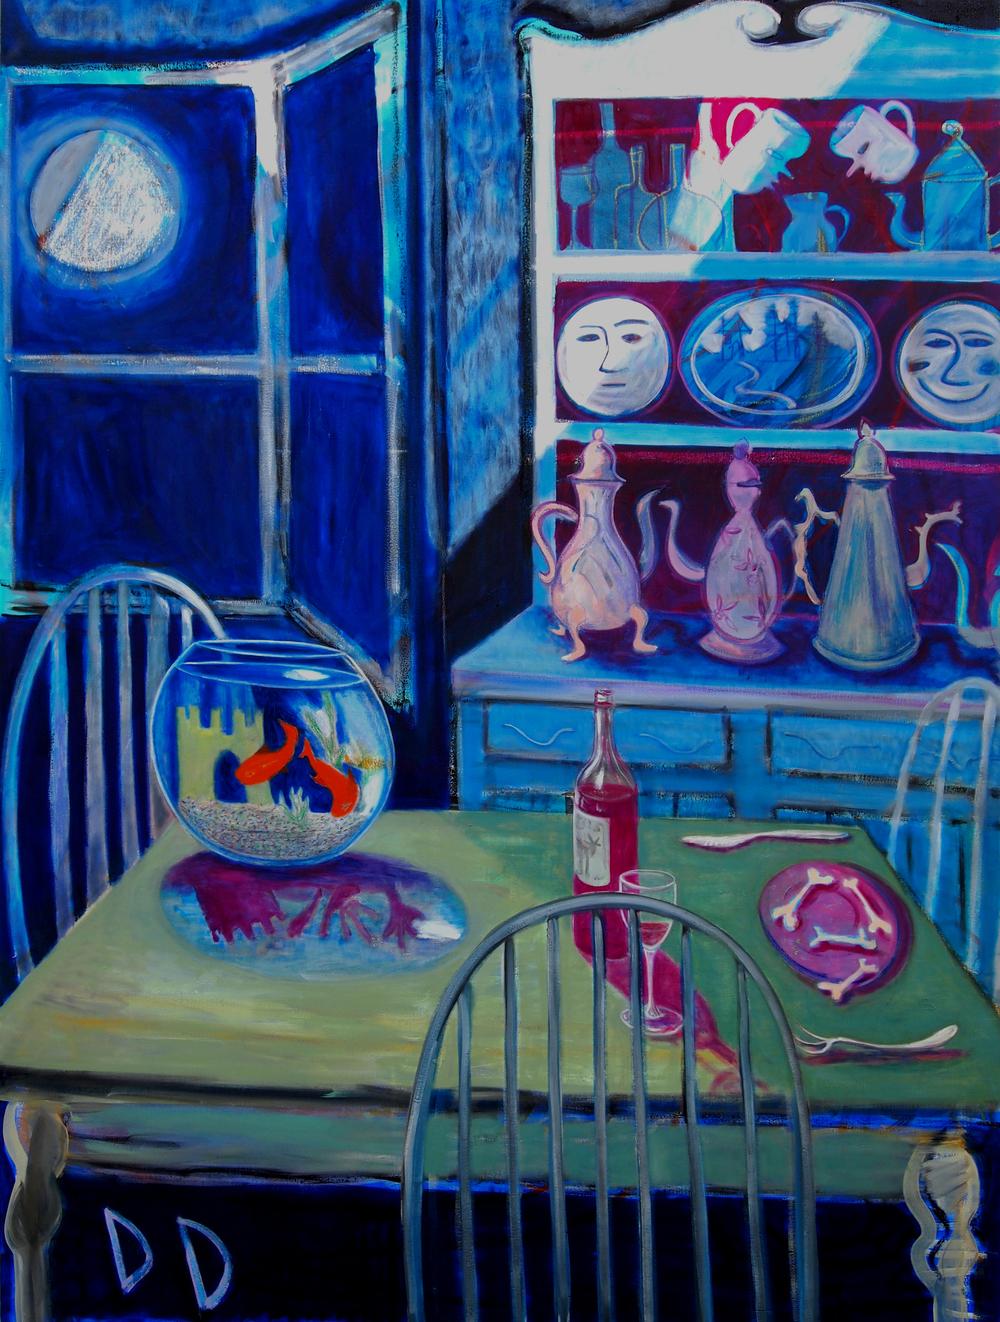 Moon in a Blue Room  Oil on Linen  150 x 200cm  2015